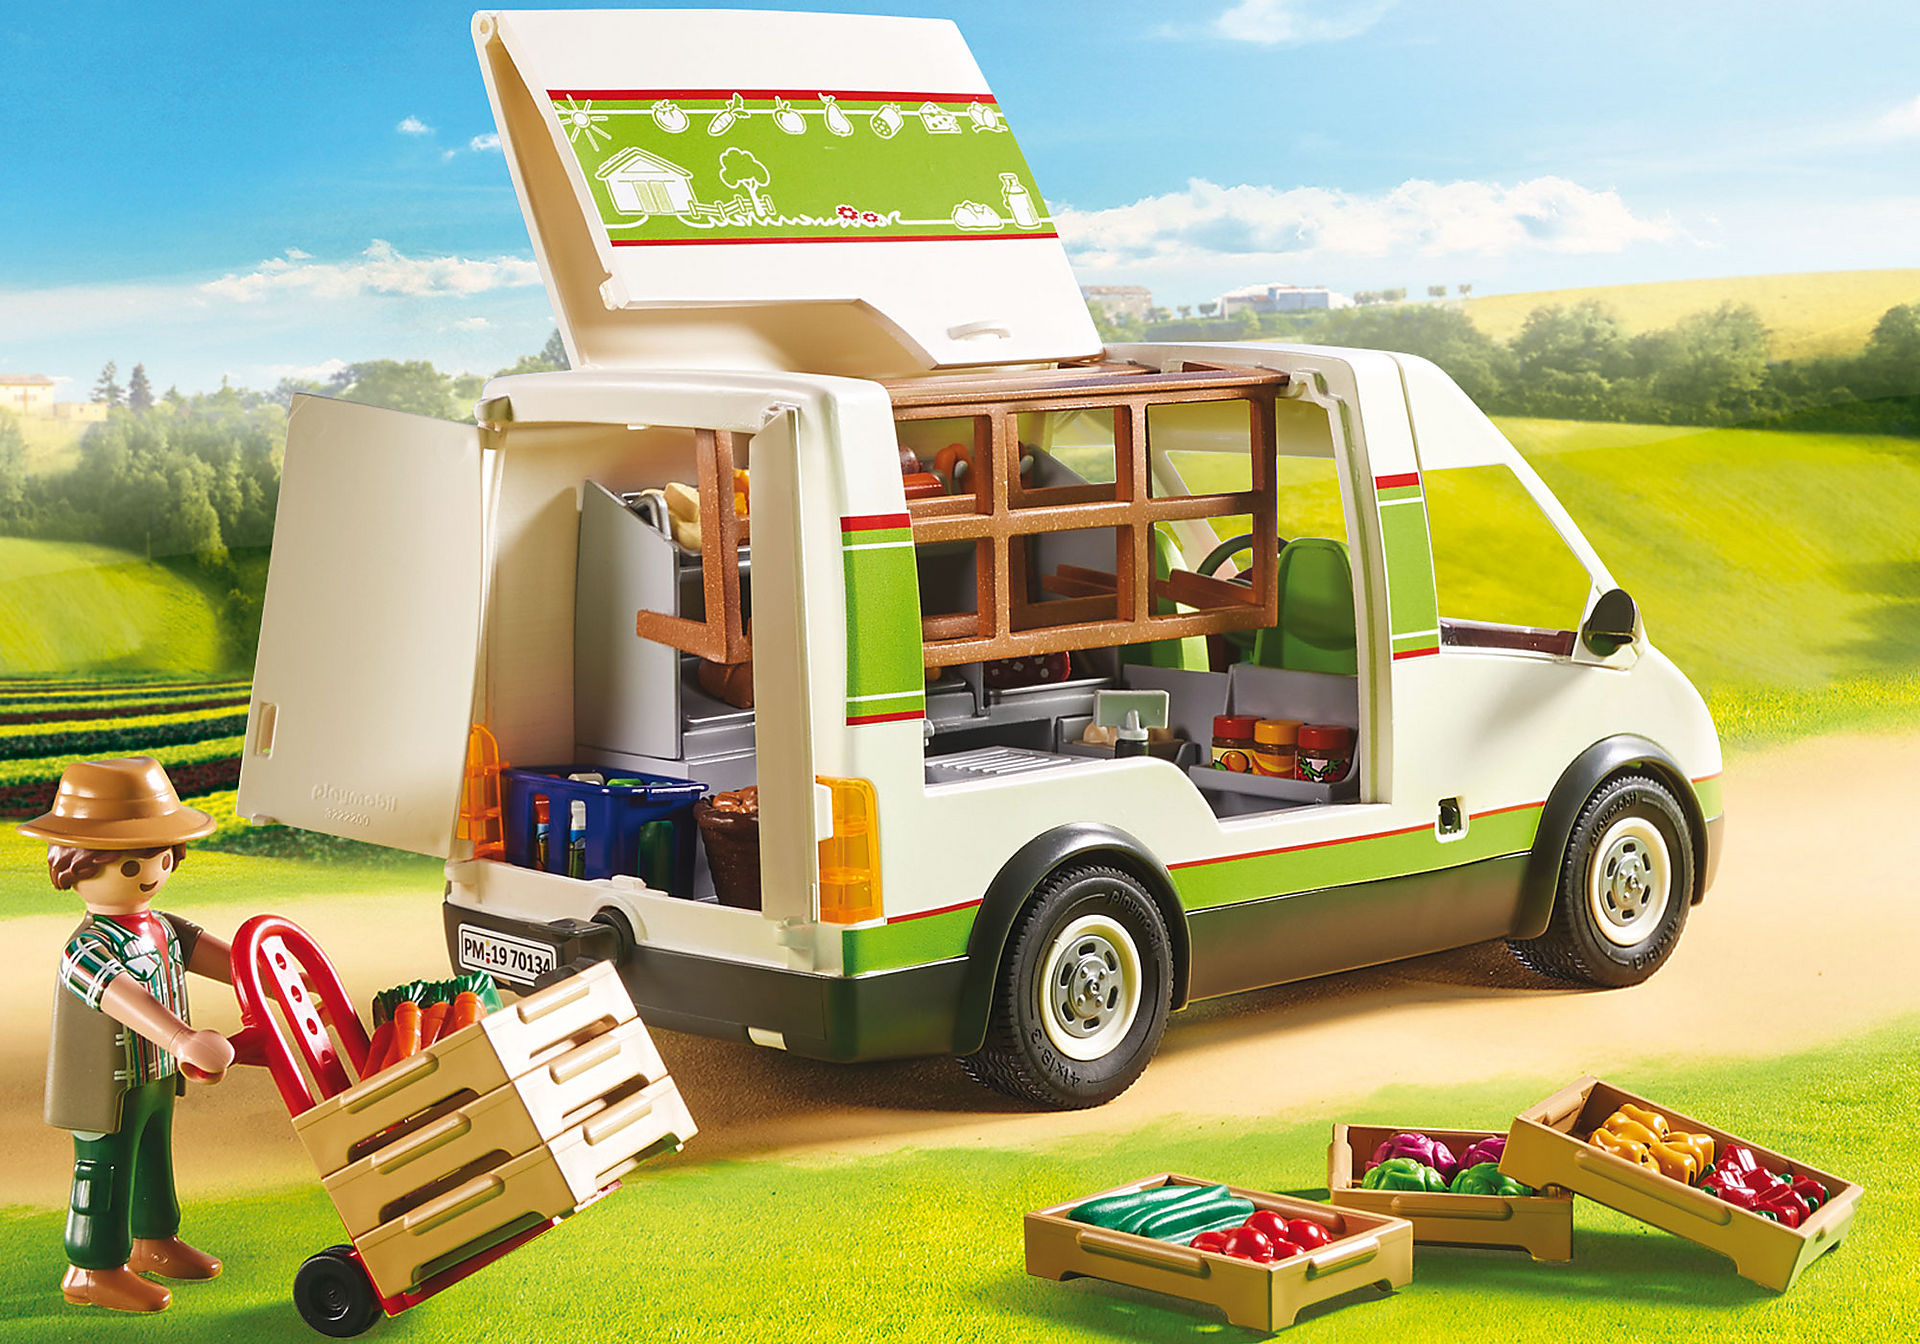 http://media.playmobil.com/i/playmobil/70134_product_extra1/Mobilt gårdmarked